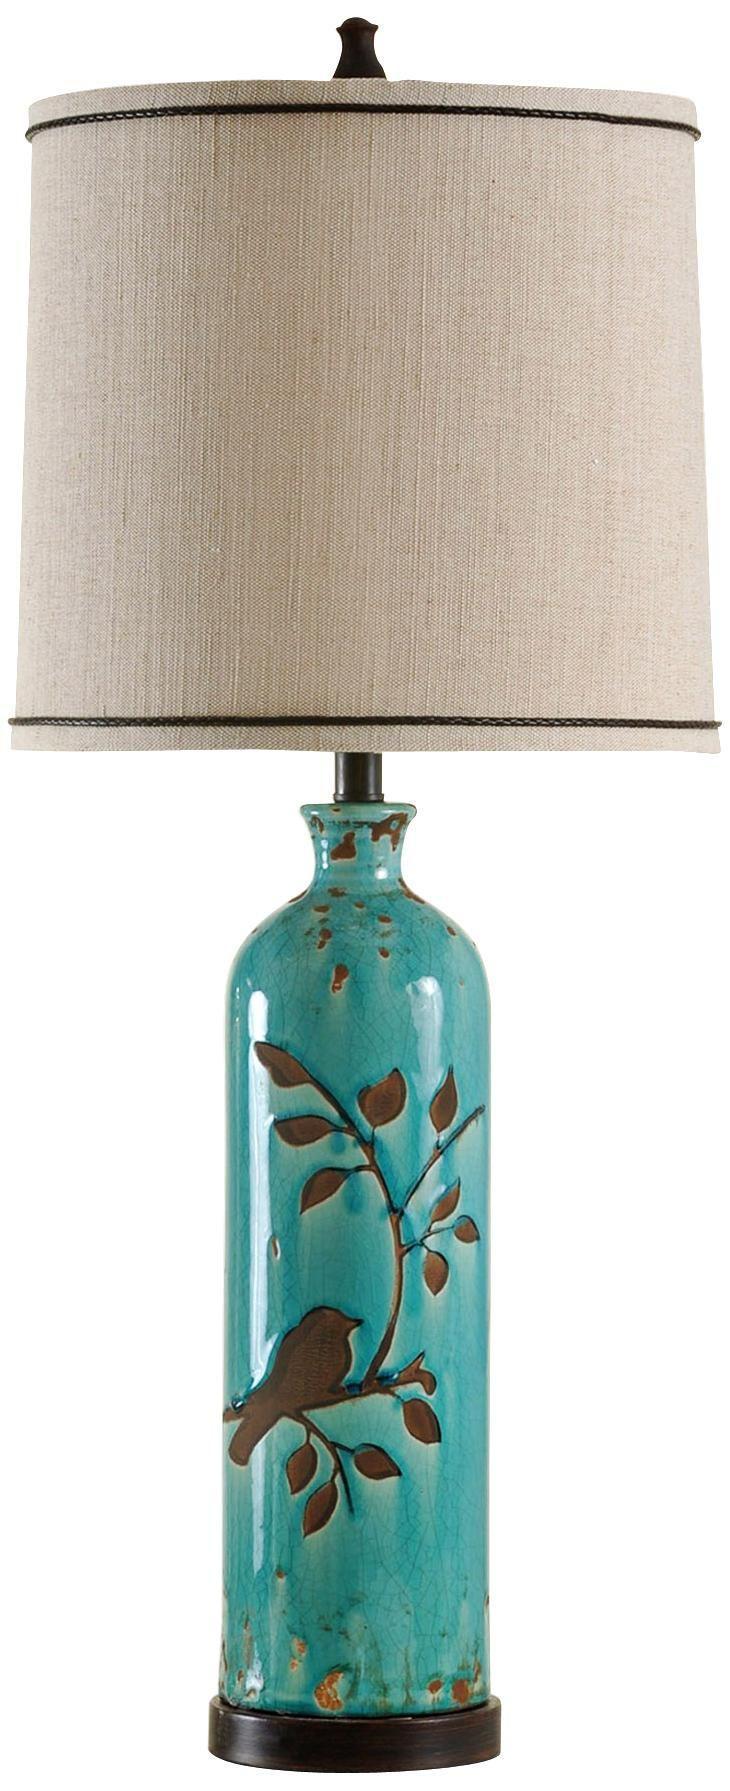 Adele Ceramic Foliage And Bird Turquoise Table Lamp Like The Bird